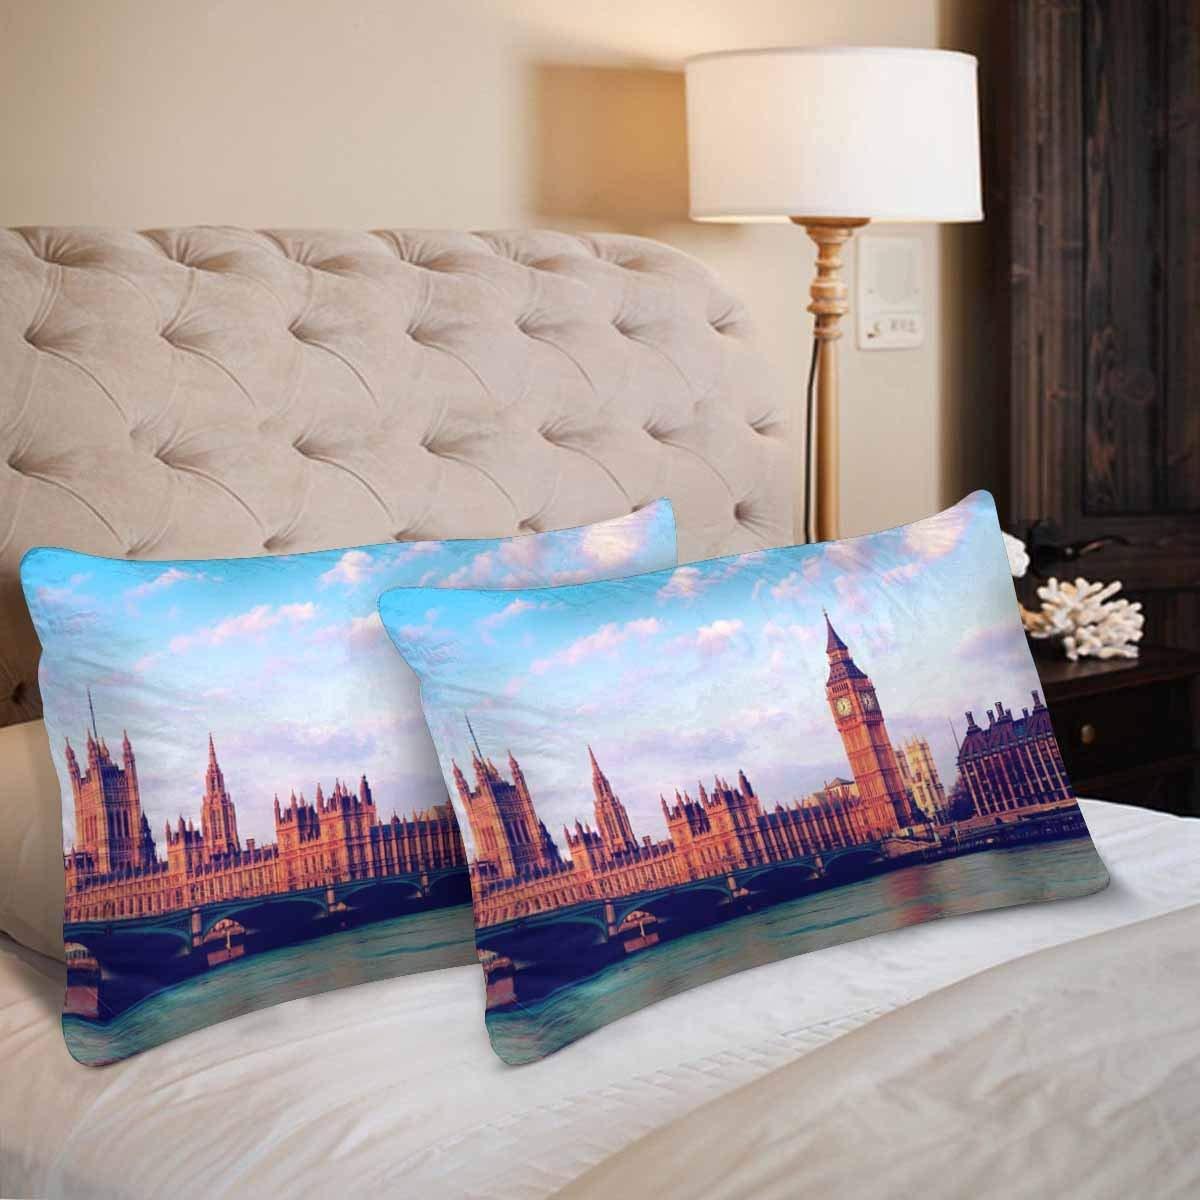 GCKG Retro tower Big Ben Bridge Early Morning Light London Pillow Cases Pillowcase 20x30 inches Set of 2 - image 2 de 4